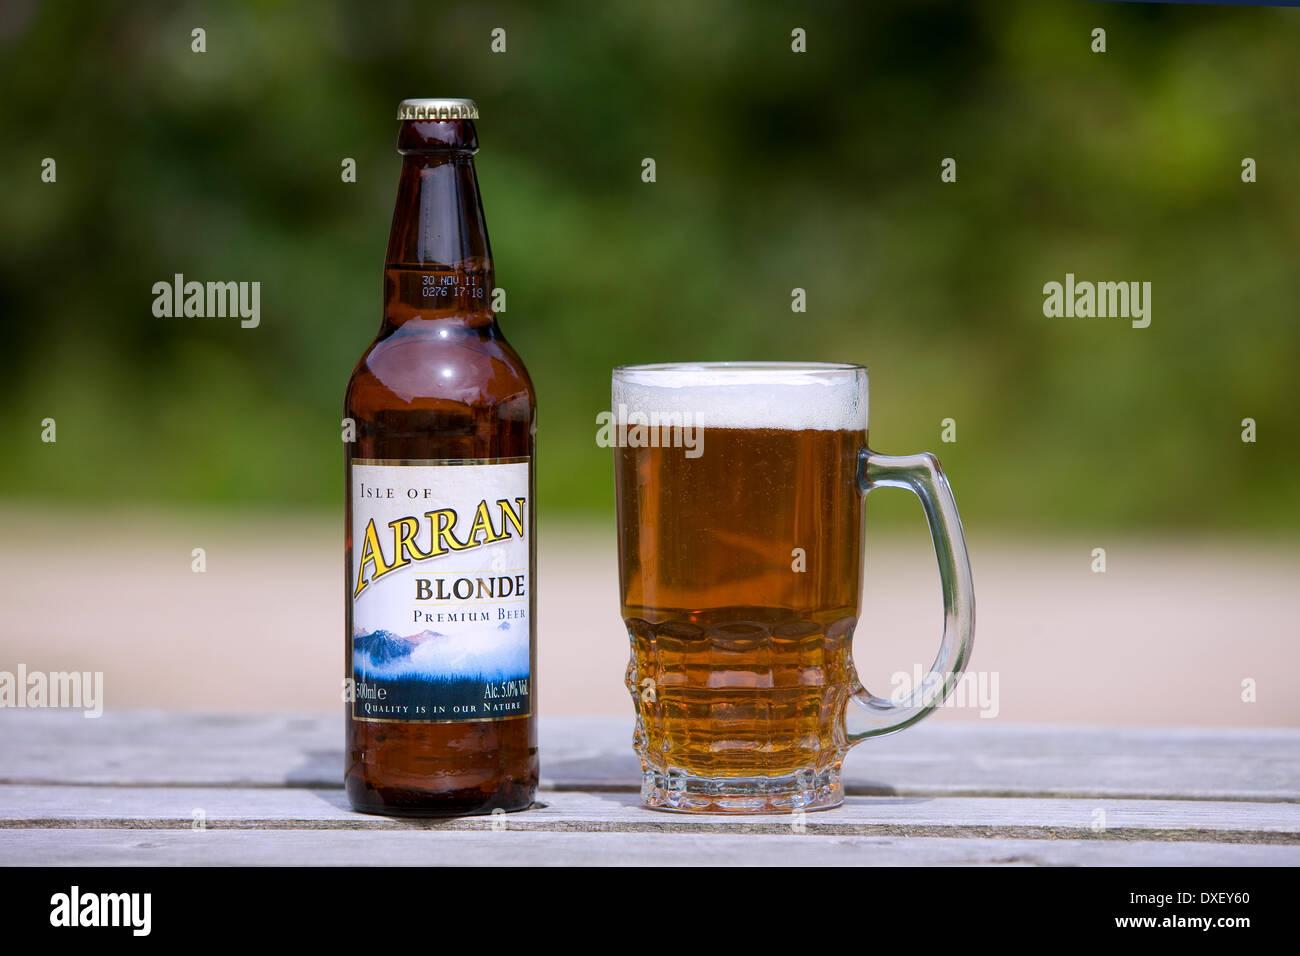 Isle of Arran brewery latest premium beer - Stock Image